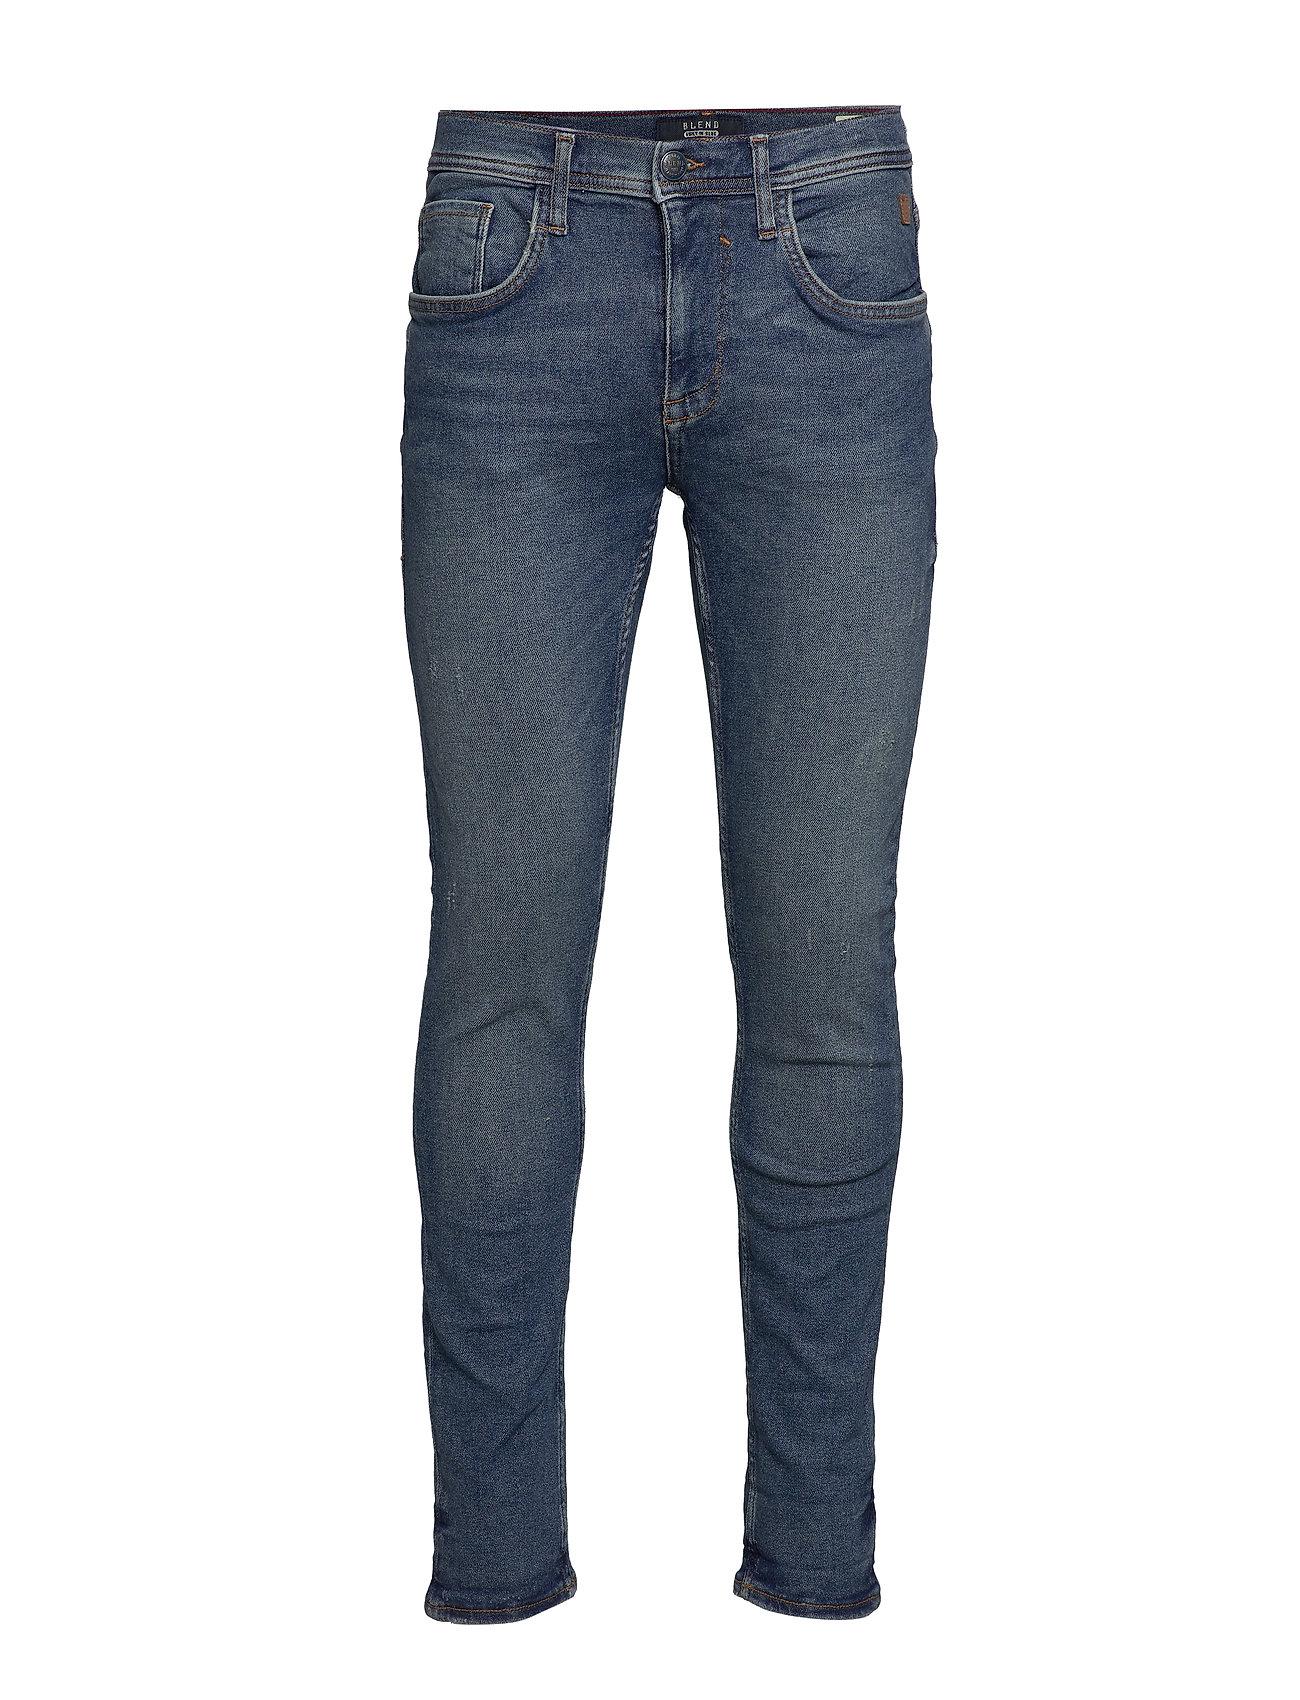 Blend Jeans - Multiflex - DENIM MIDDLE BLUE